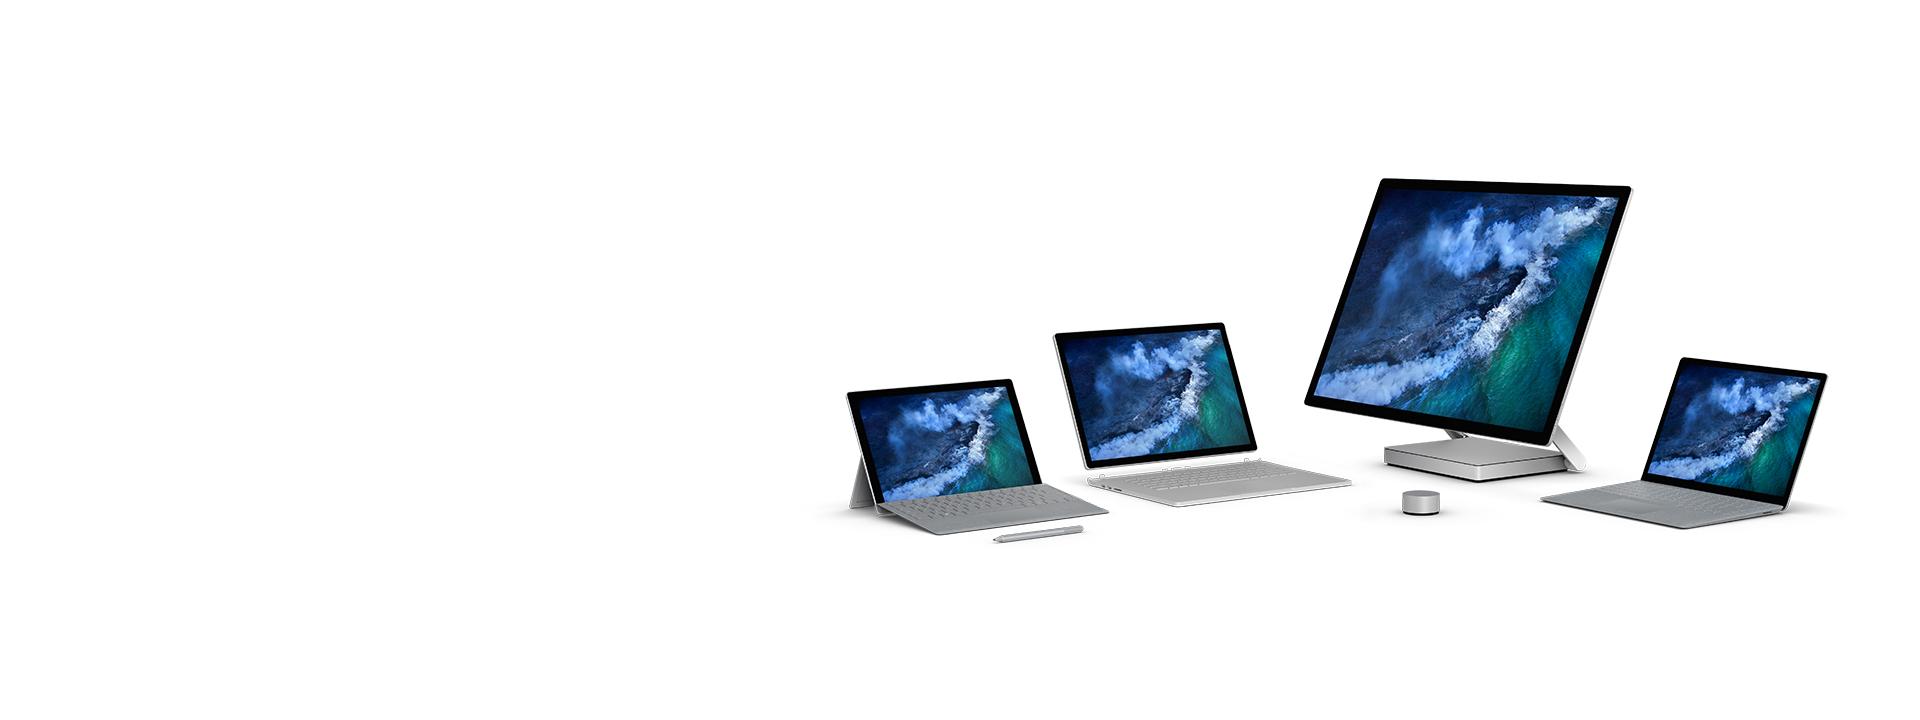 Die Surface-Familie: Surface Pro, Surface Laptop, Surface Book 2 und Surface Studio